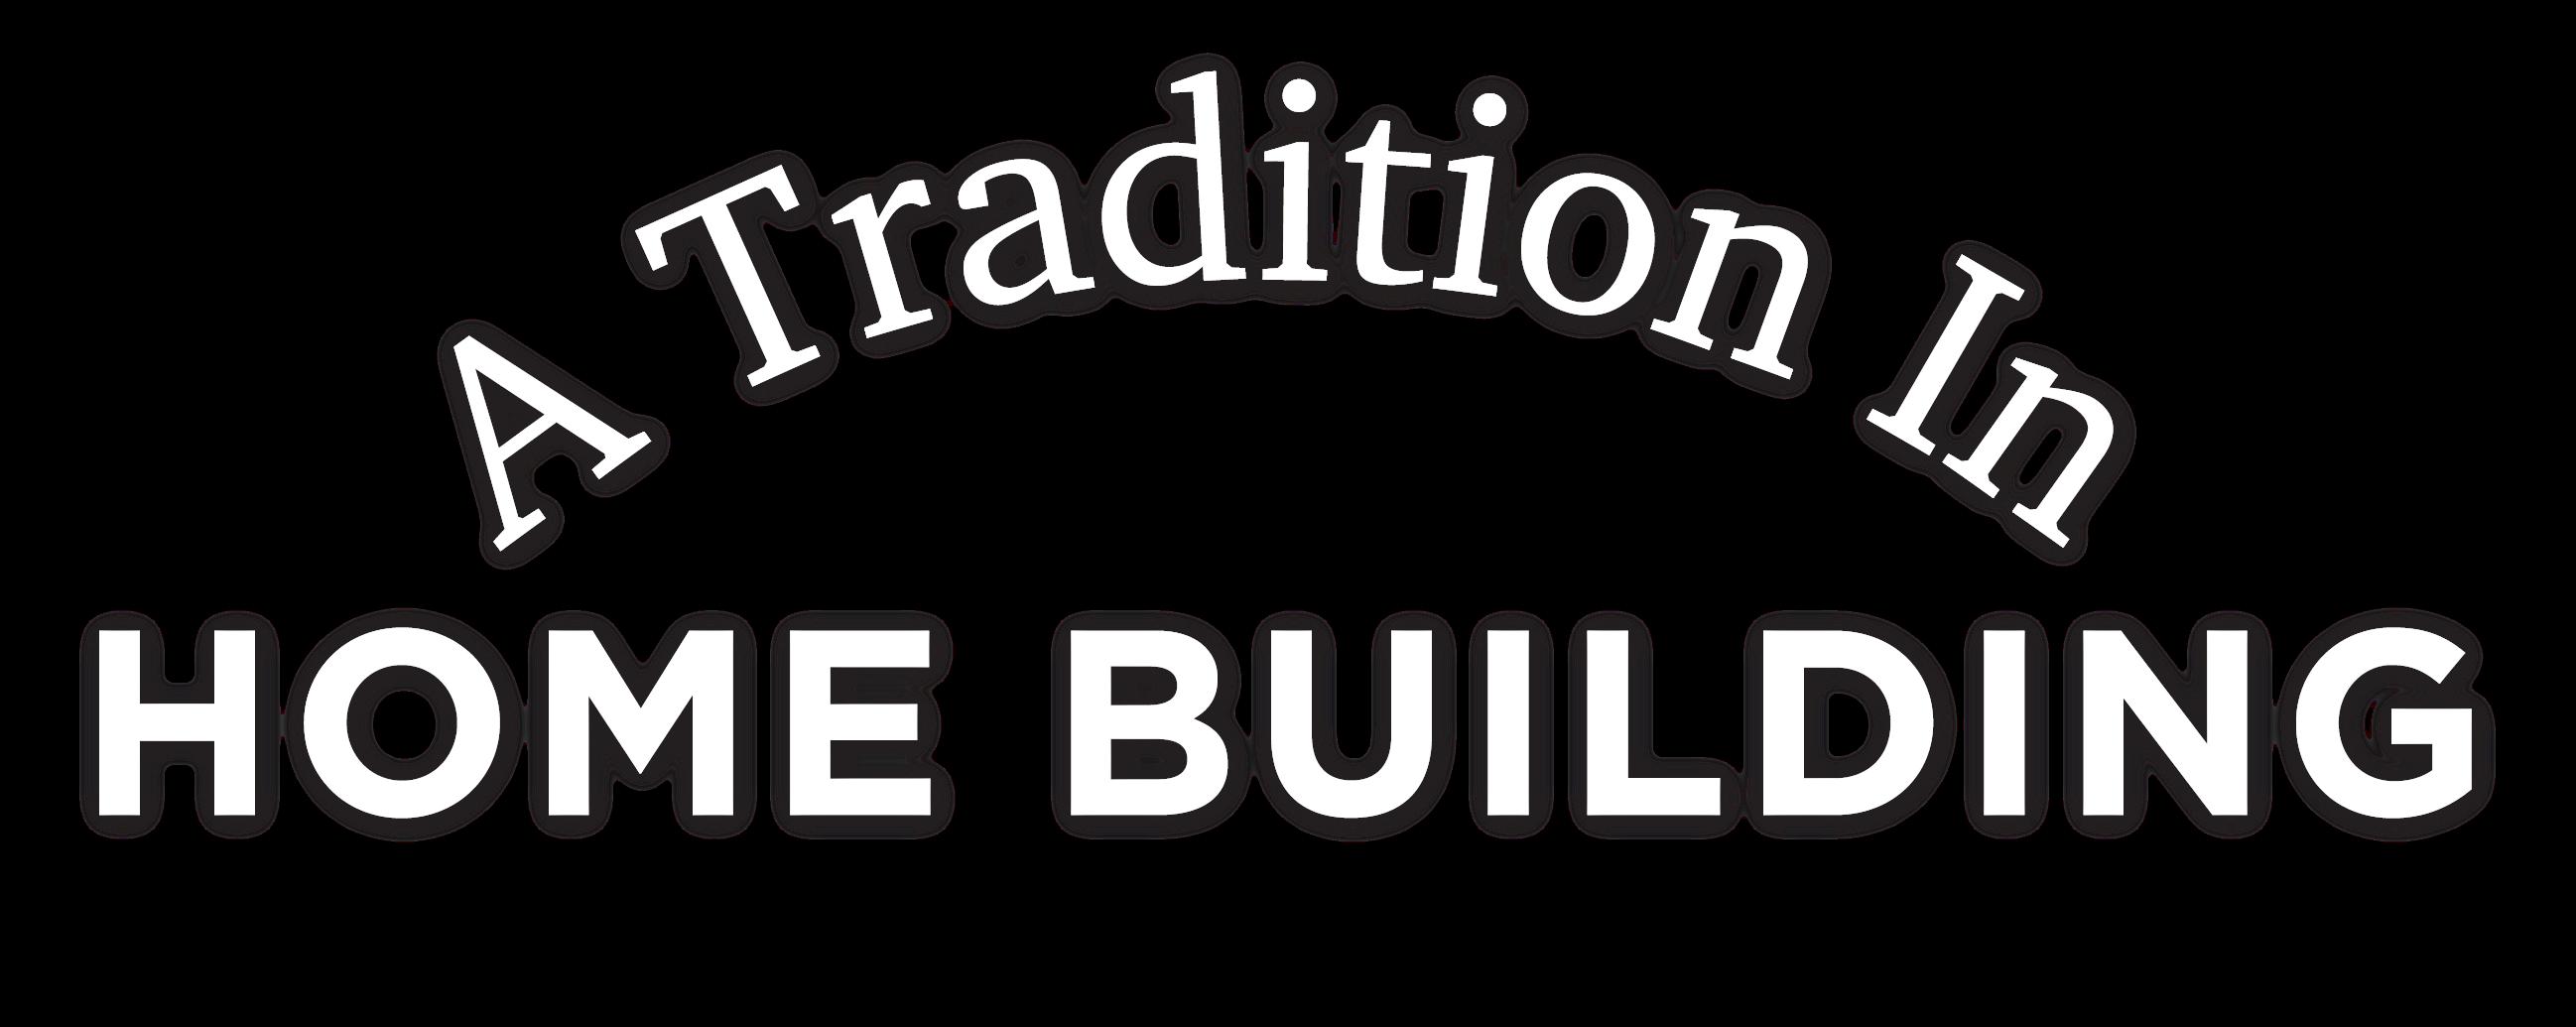 traditionin